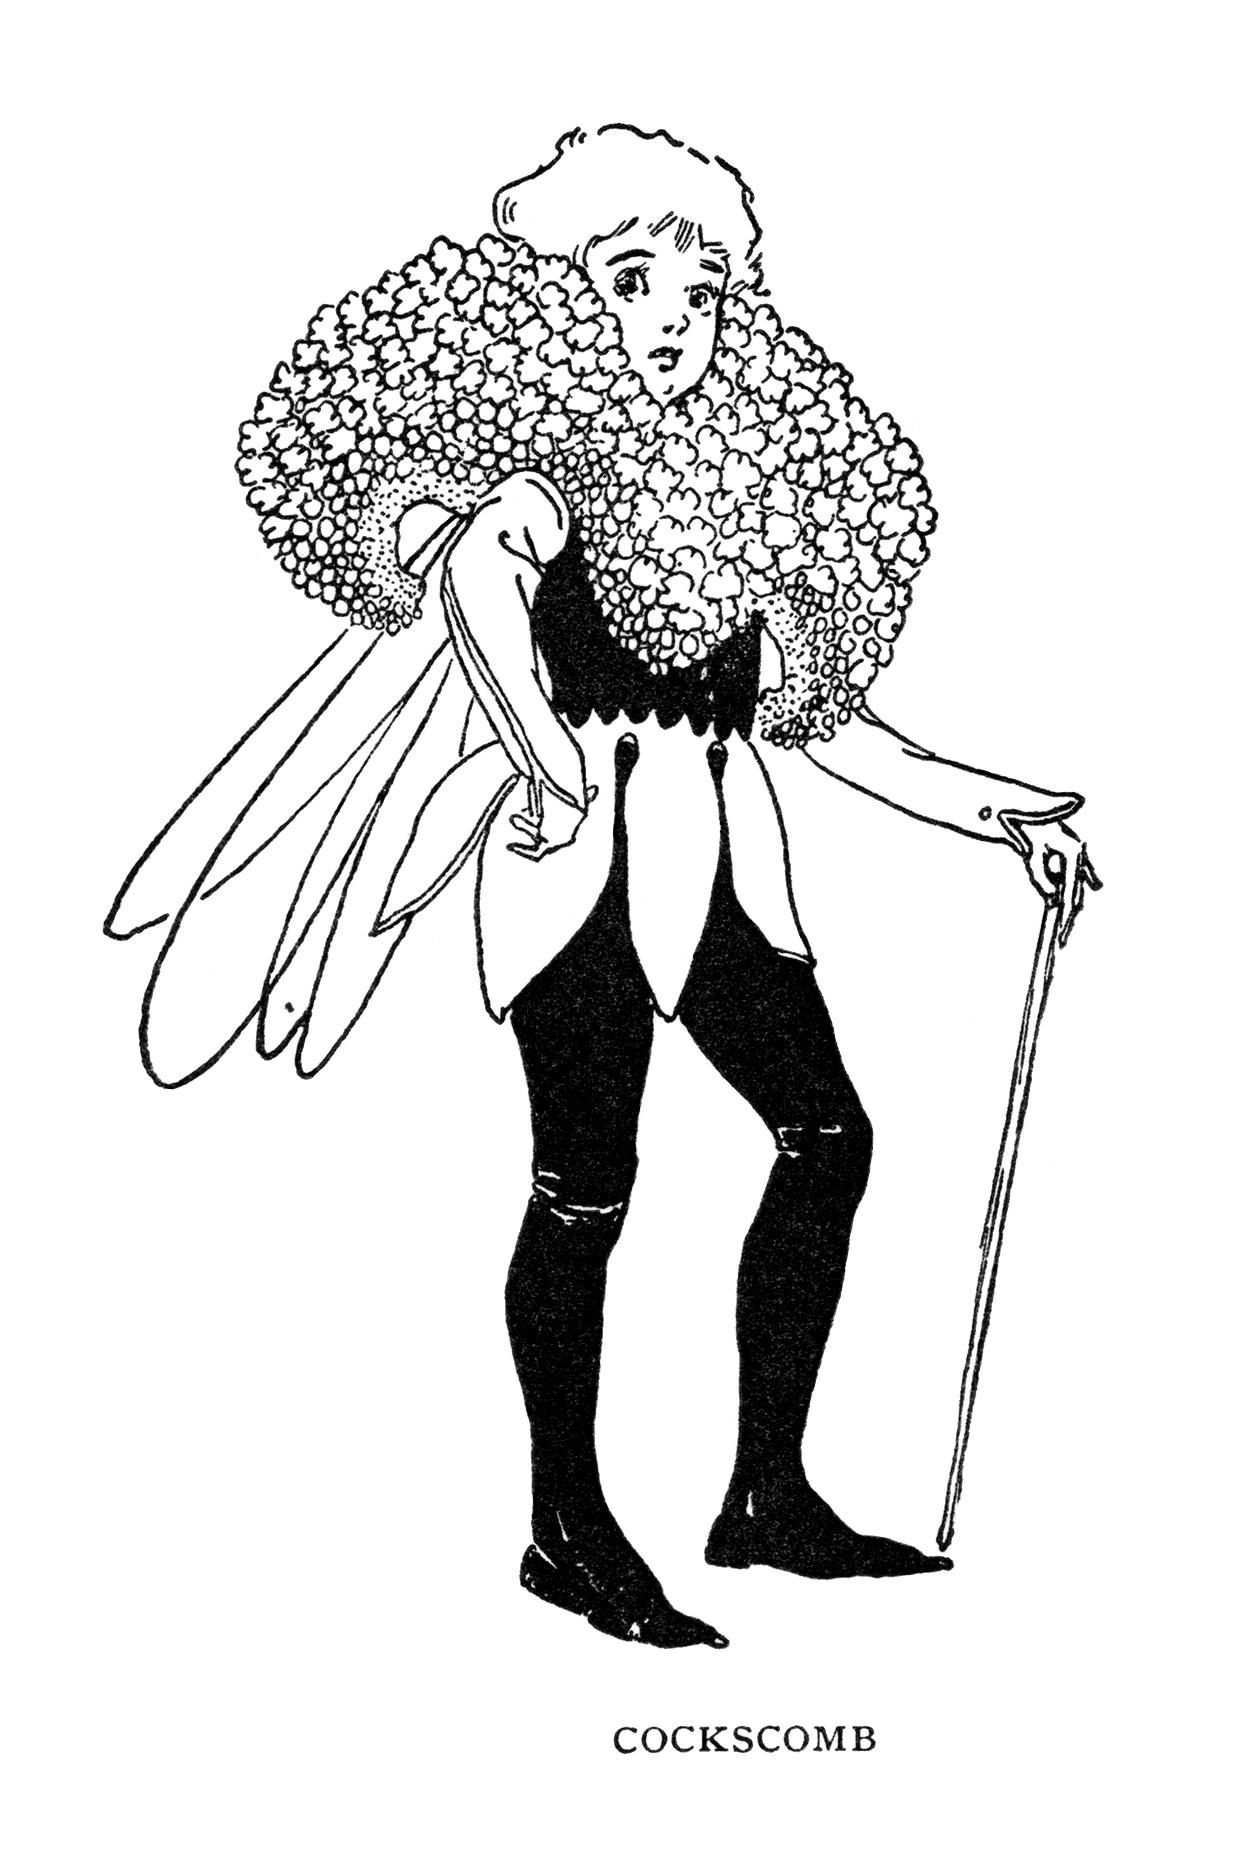 Cockscomb Storybook Character